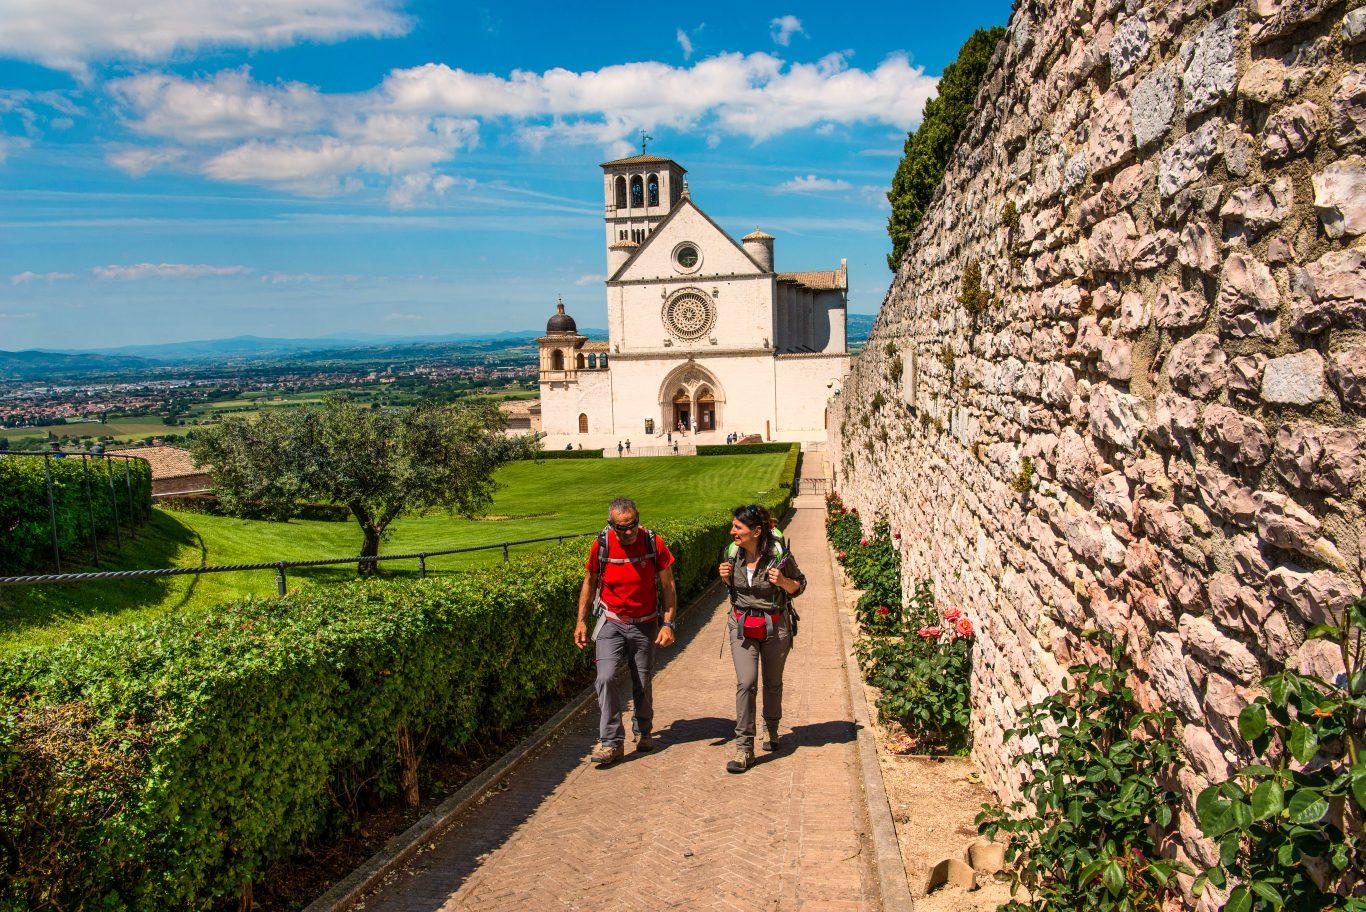 Via di Francesco Basilica San-Francesco-Assisi-Fabrizio-Ardito